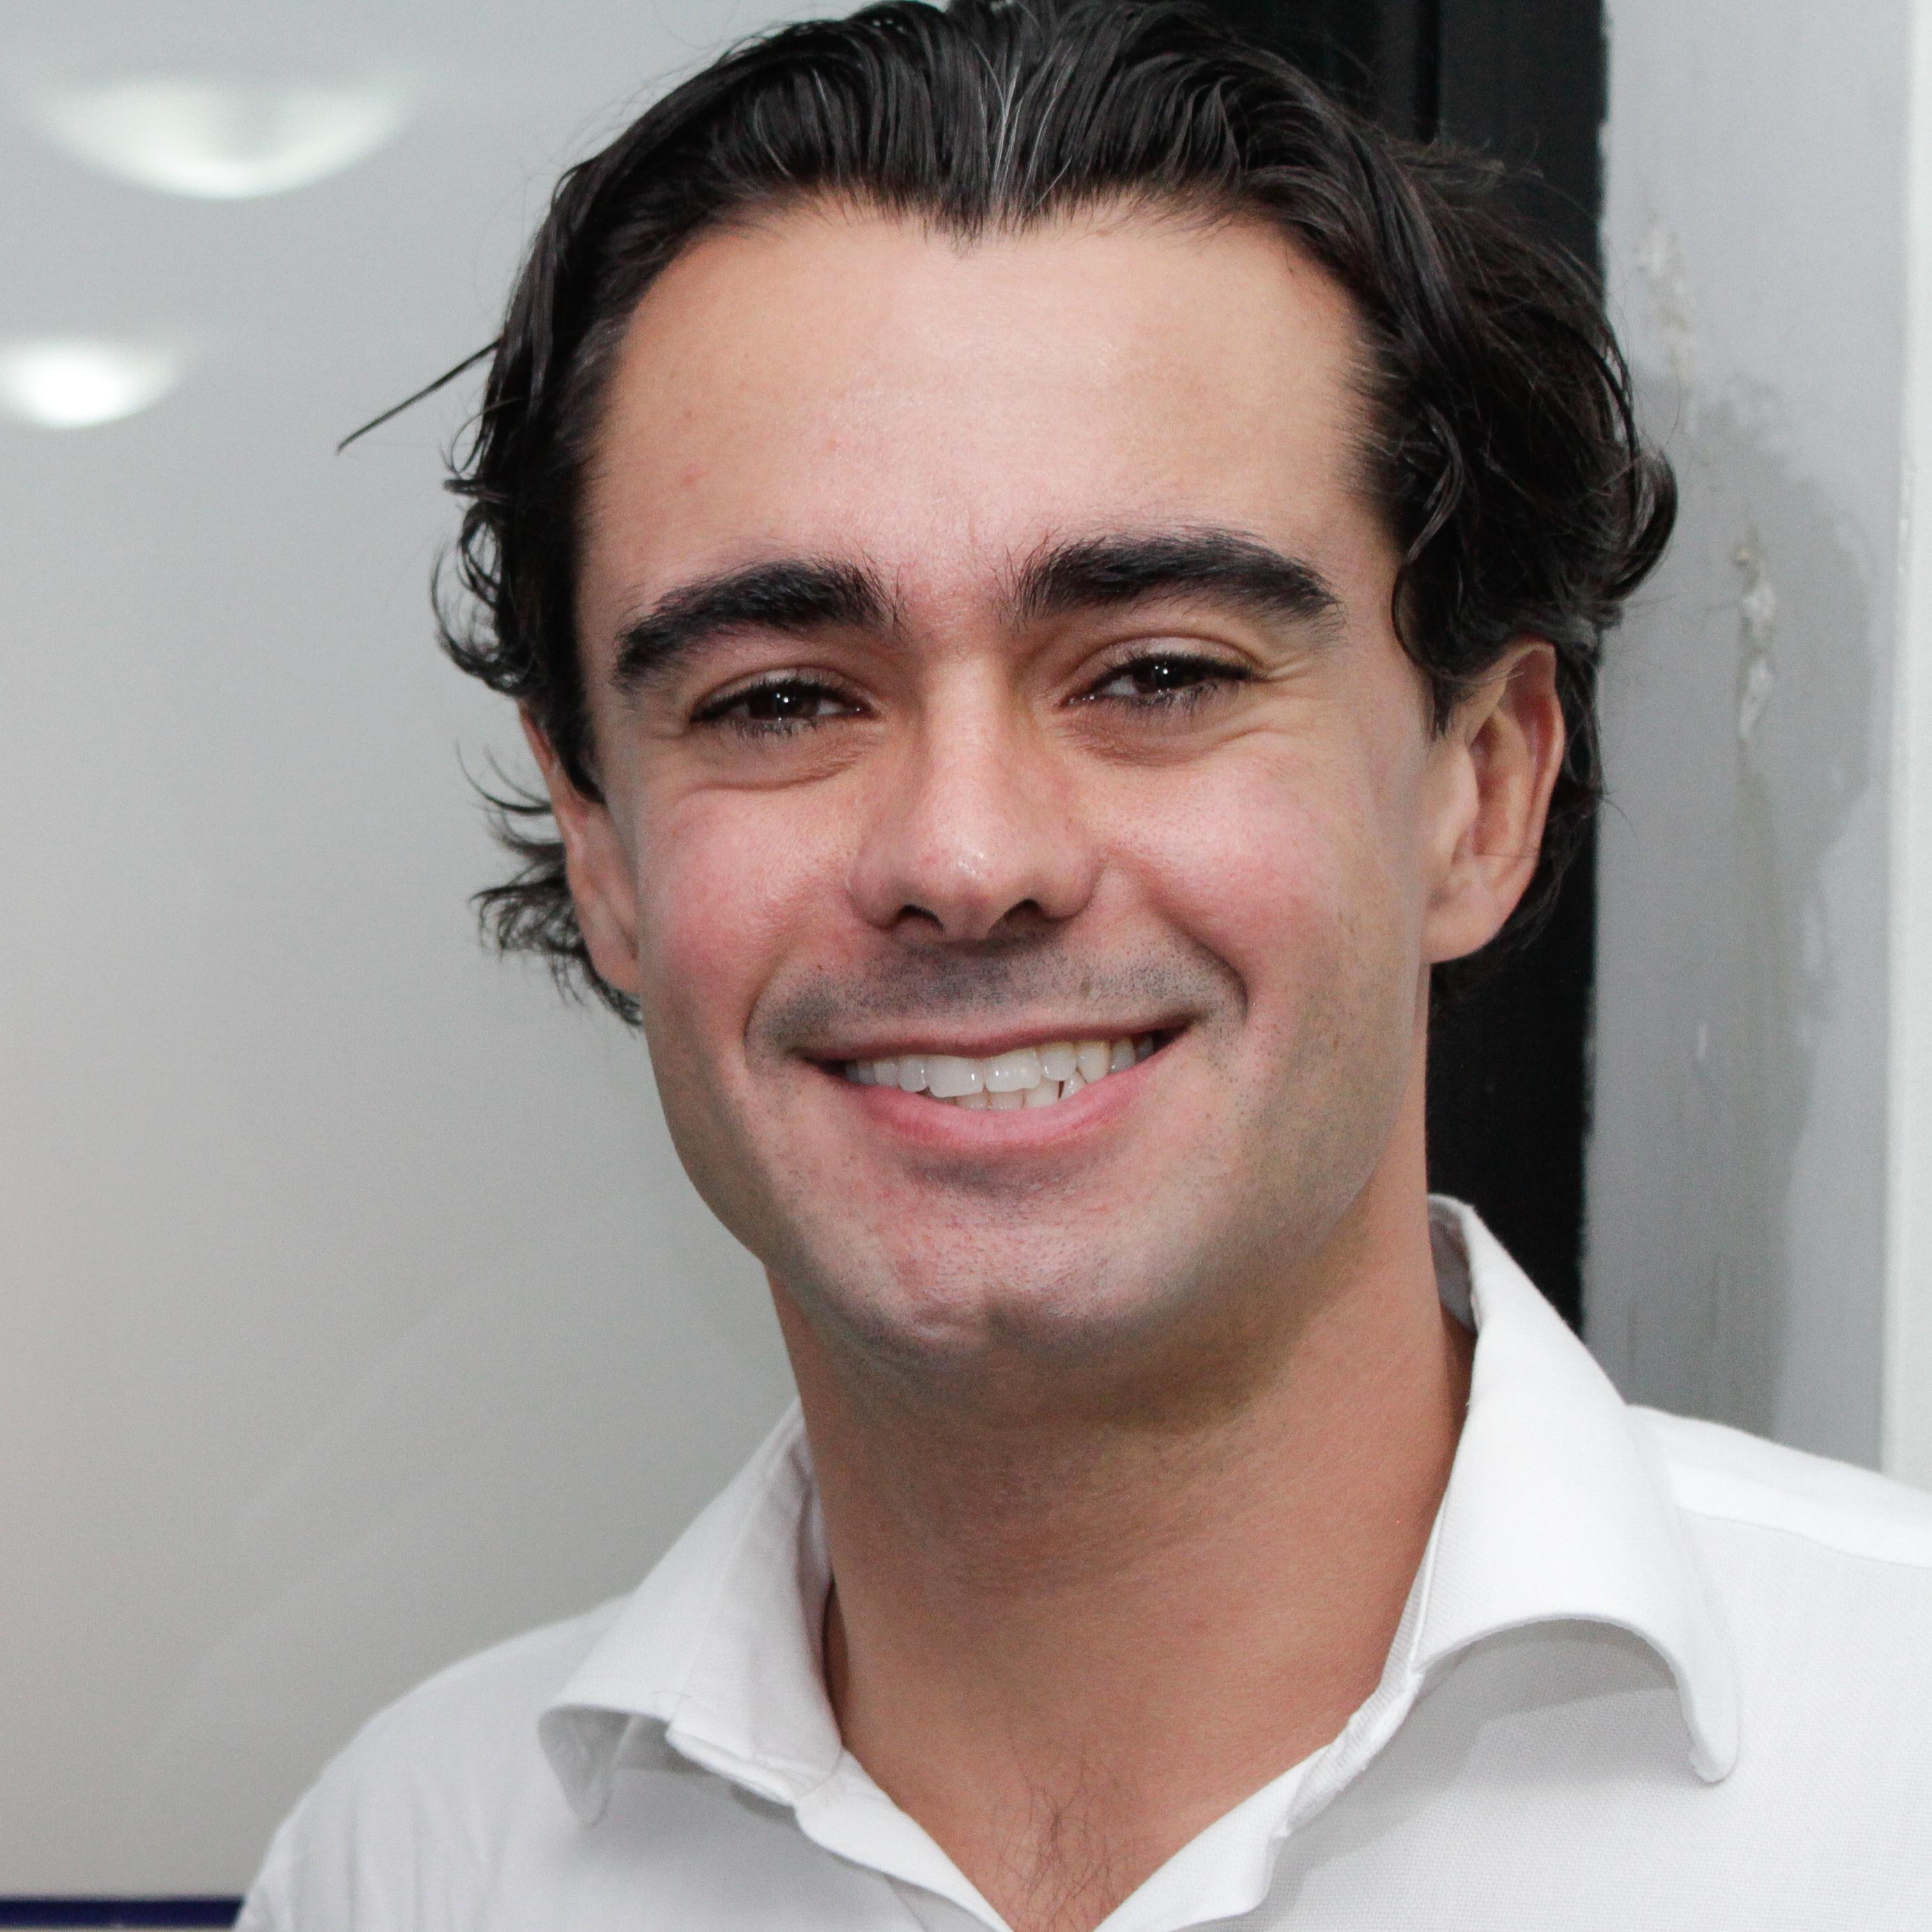 Francisco Jardim